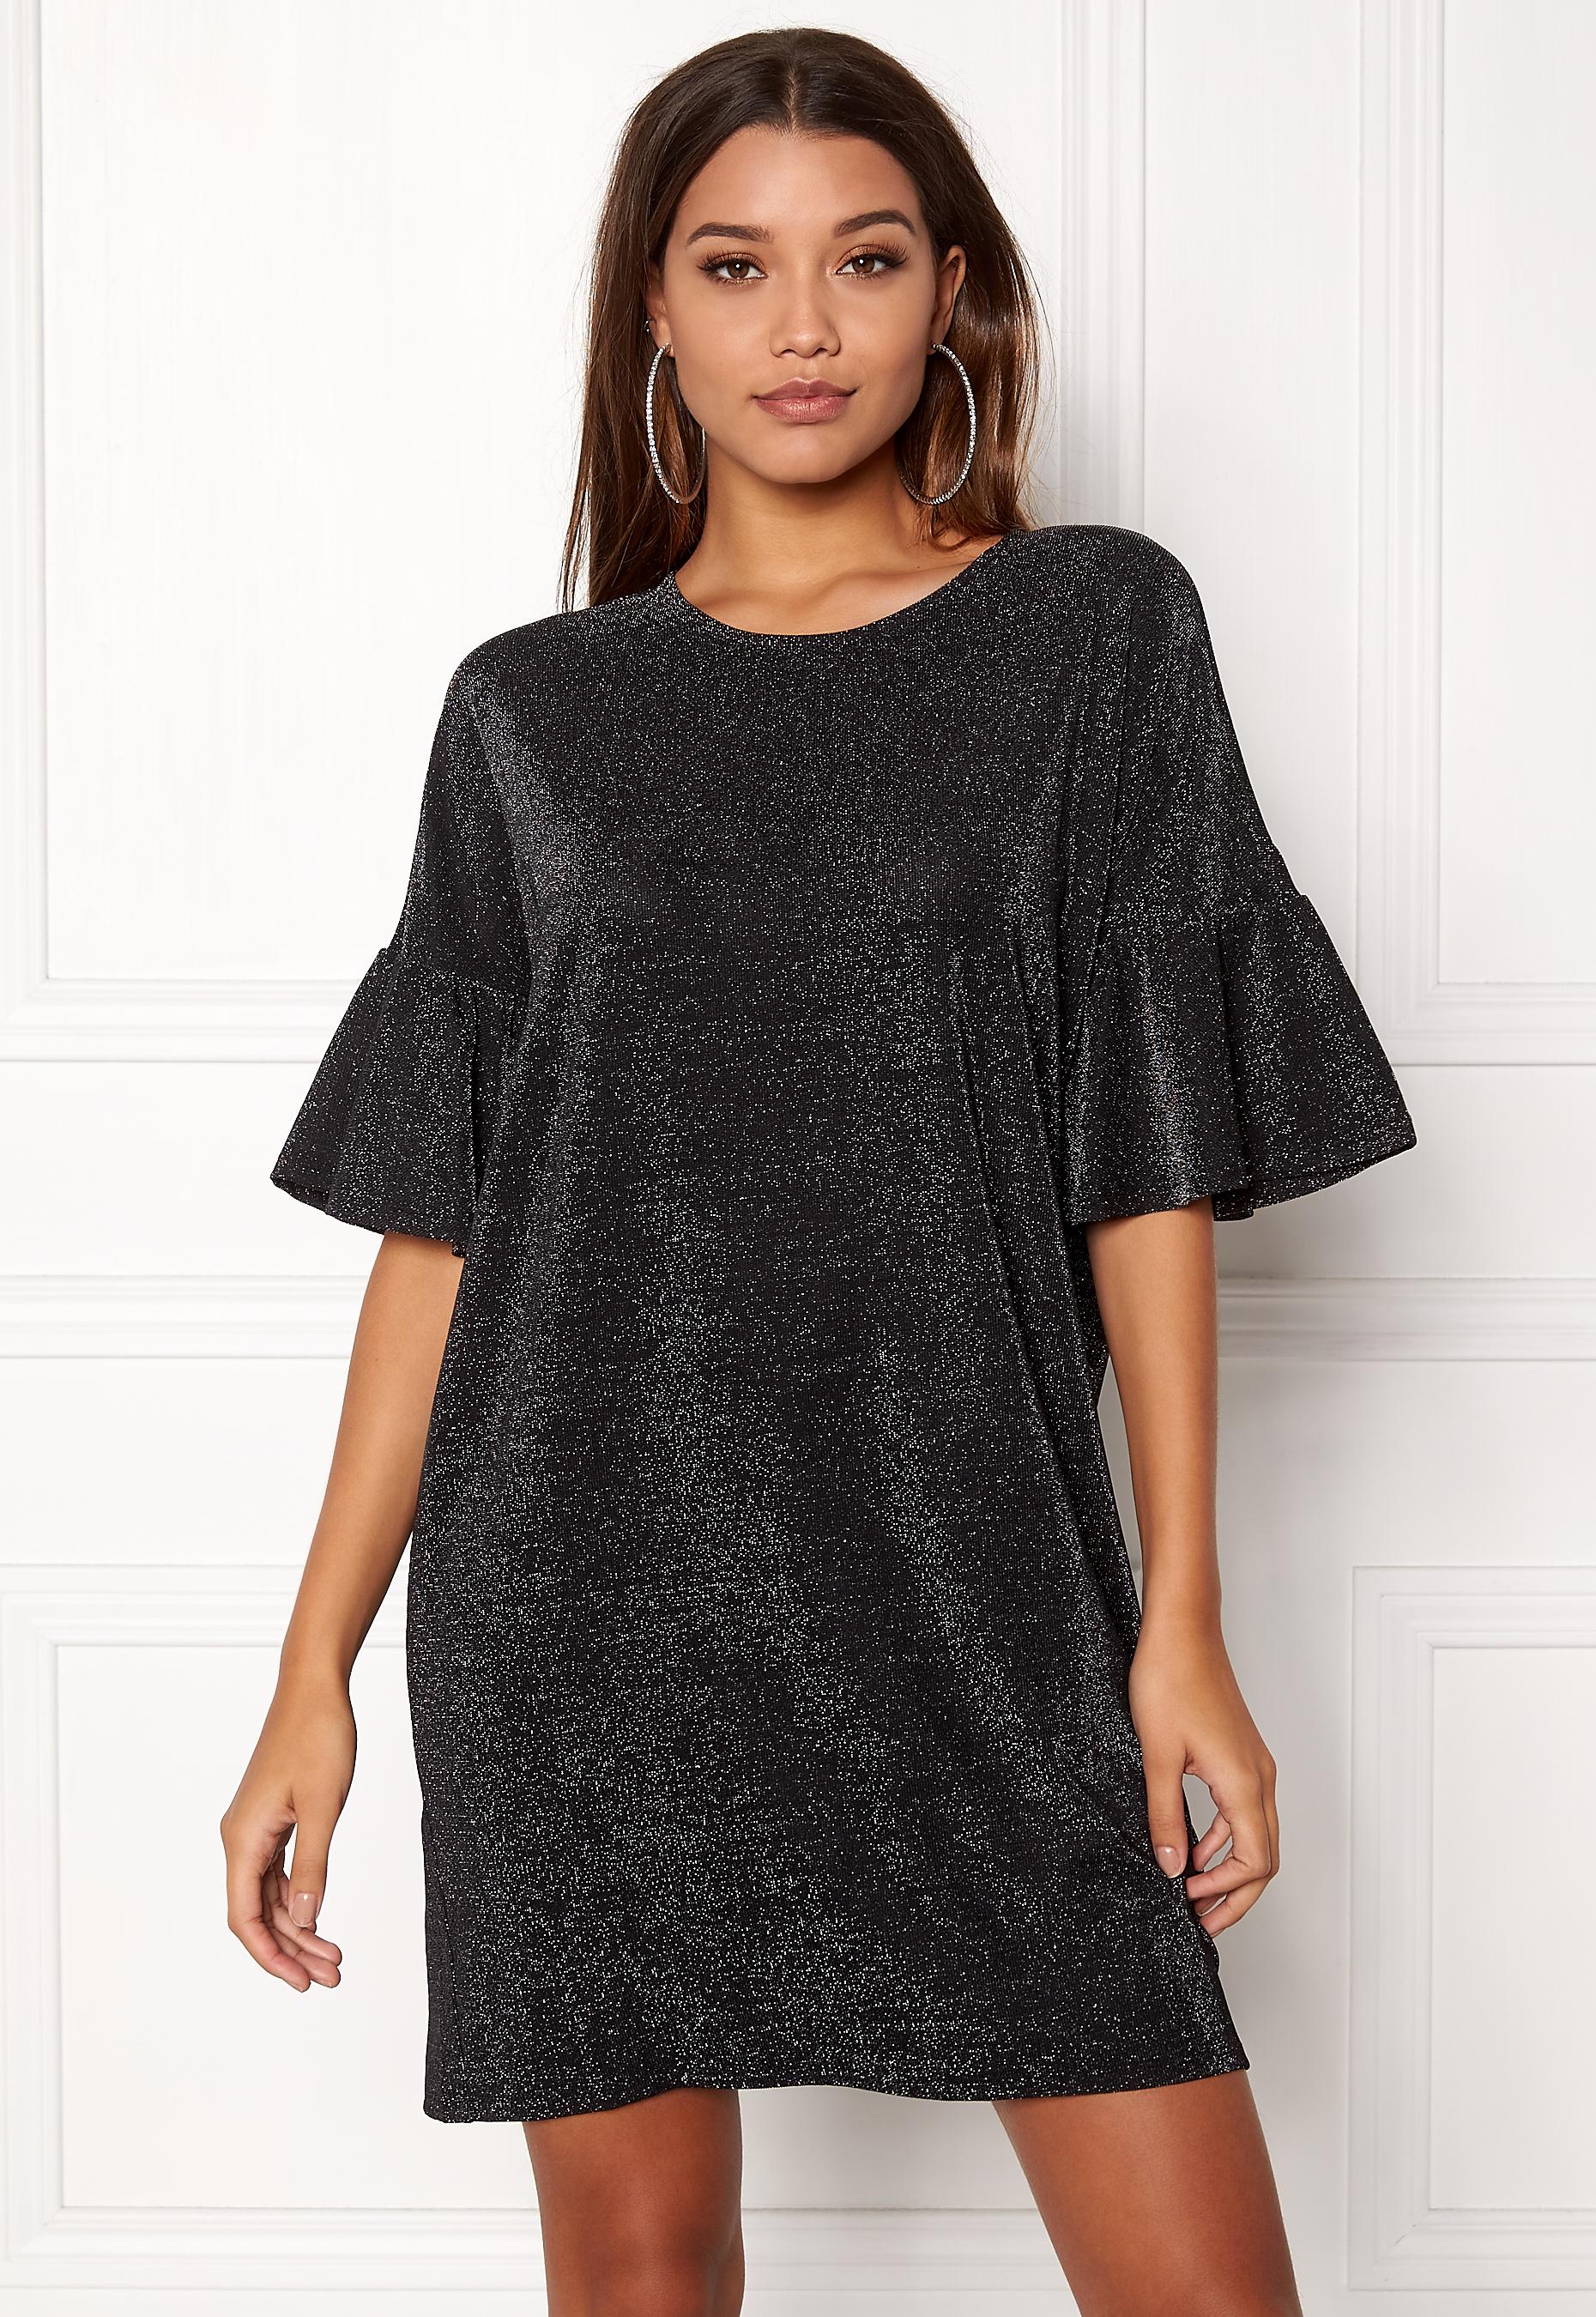 63cc66d77da1 VILA Jomine T-Shirt Dress Black - Bubbleroom